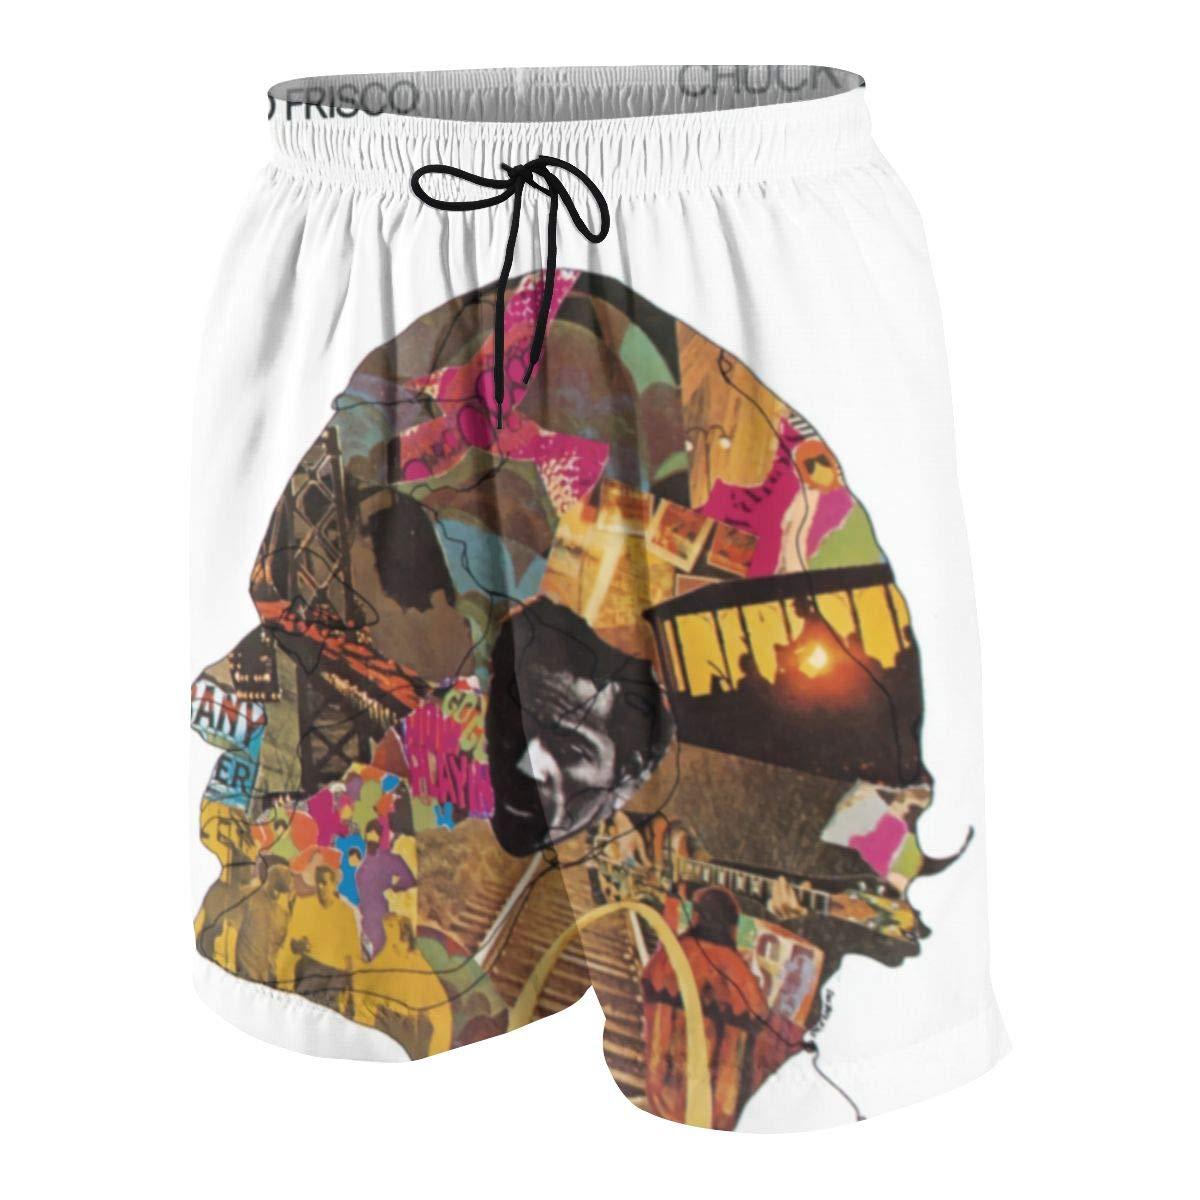 JacobKThompson Chuck Berry Summer Adolescent Men Leisure Quick Dry Surfing Beach Shorts Elastic Band Pocket Drawstring